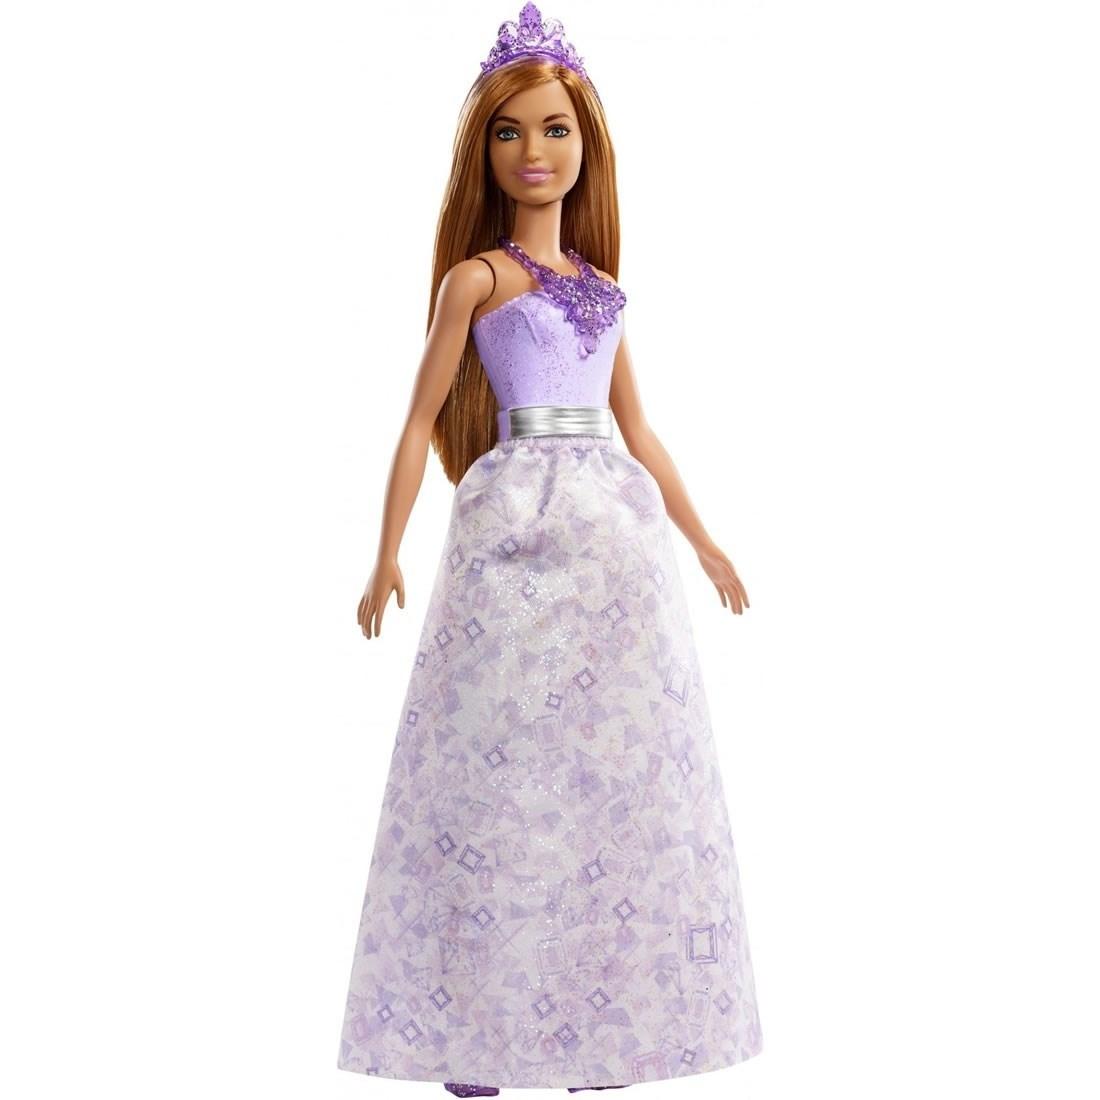 Barbie Dreamtopia Prenses Bebekler Mate Fxt13771 Sirinbabykids Com